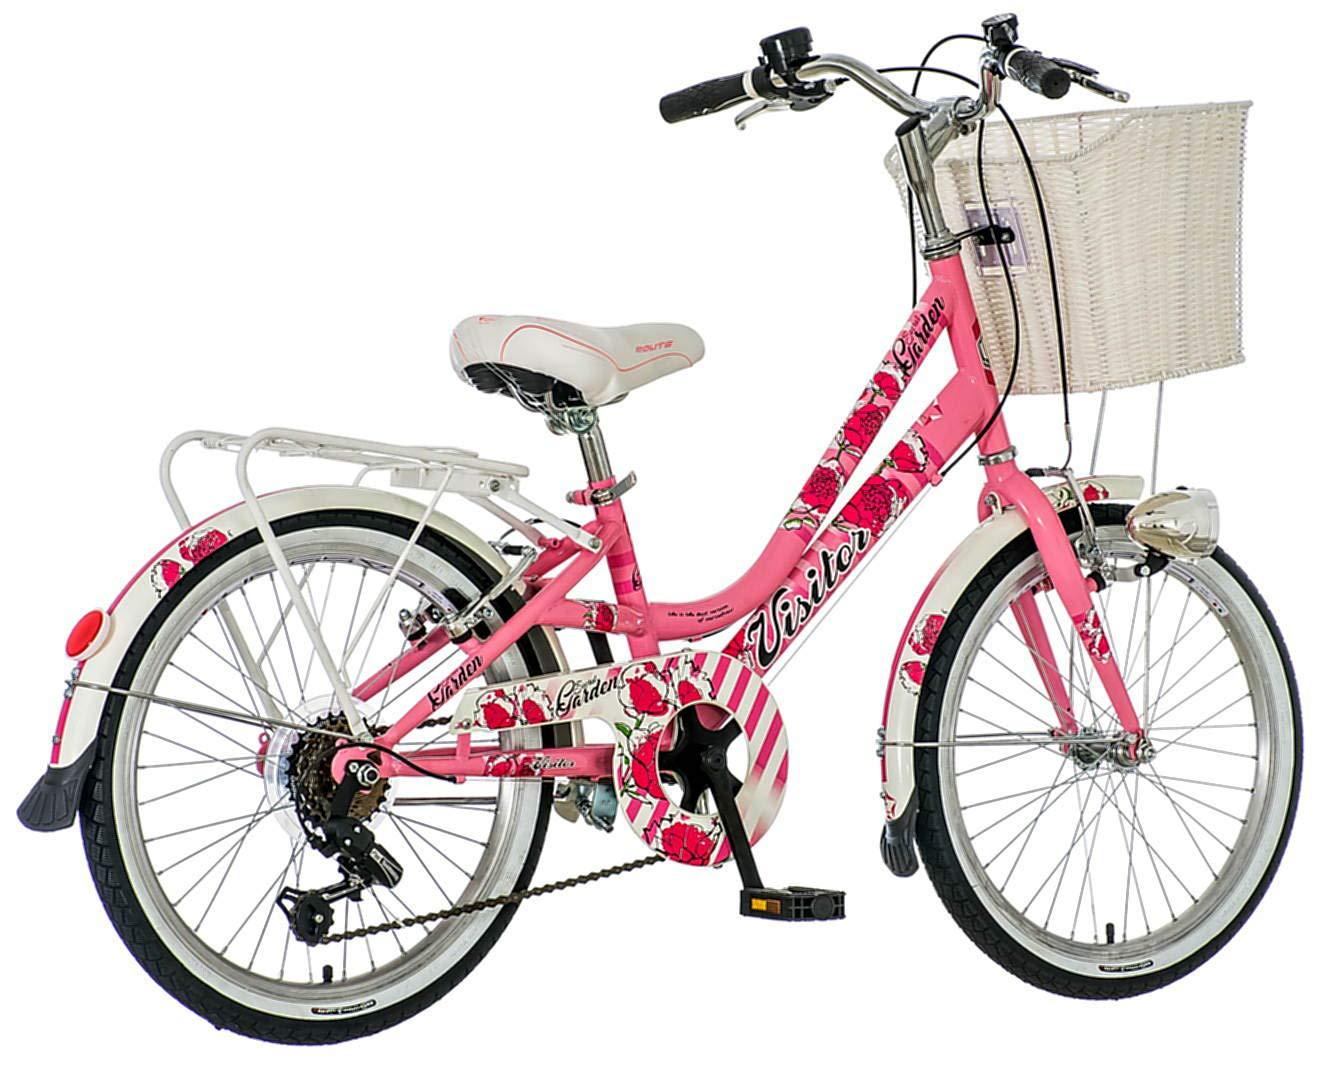 Breluxx 20 Zoll Kinderfahrrad Venera Fashion Secret Garden Citybike Korb + Licht Retro Mädchenrad, 6 Gang Shimano